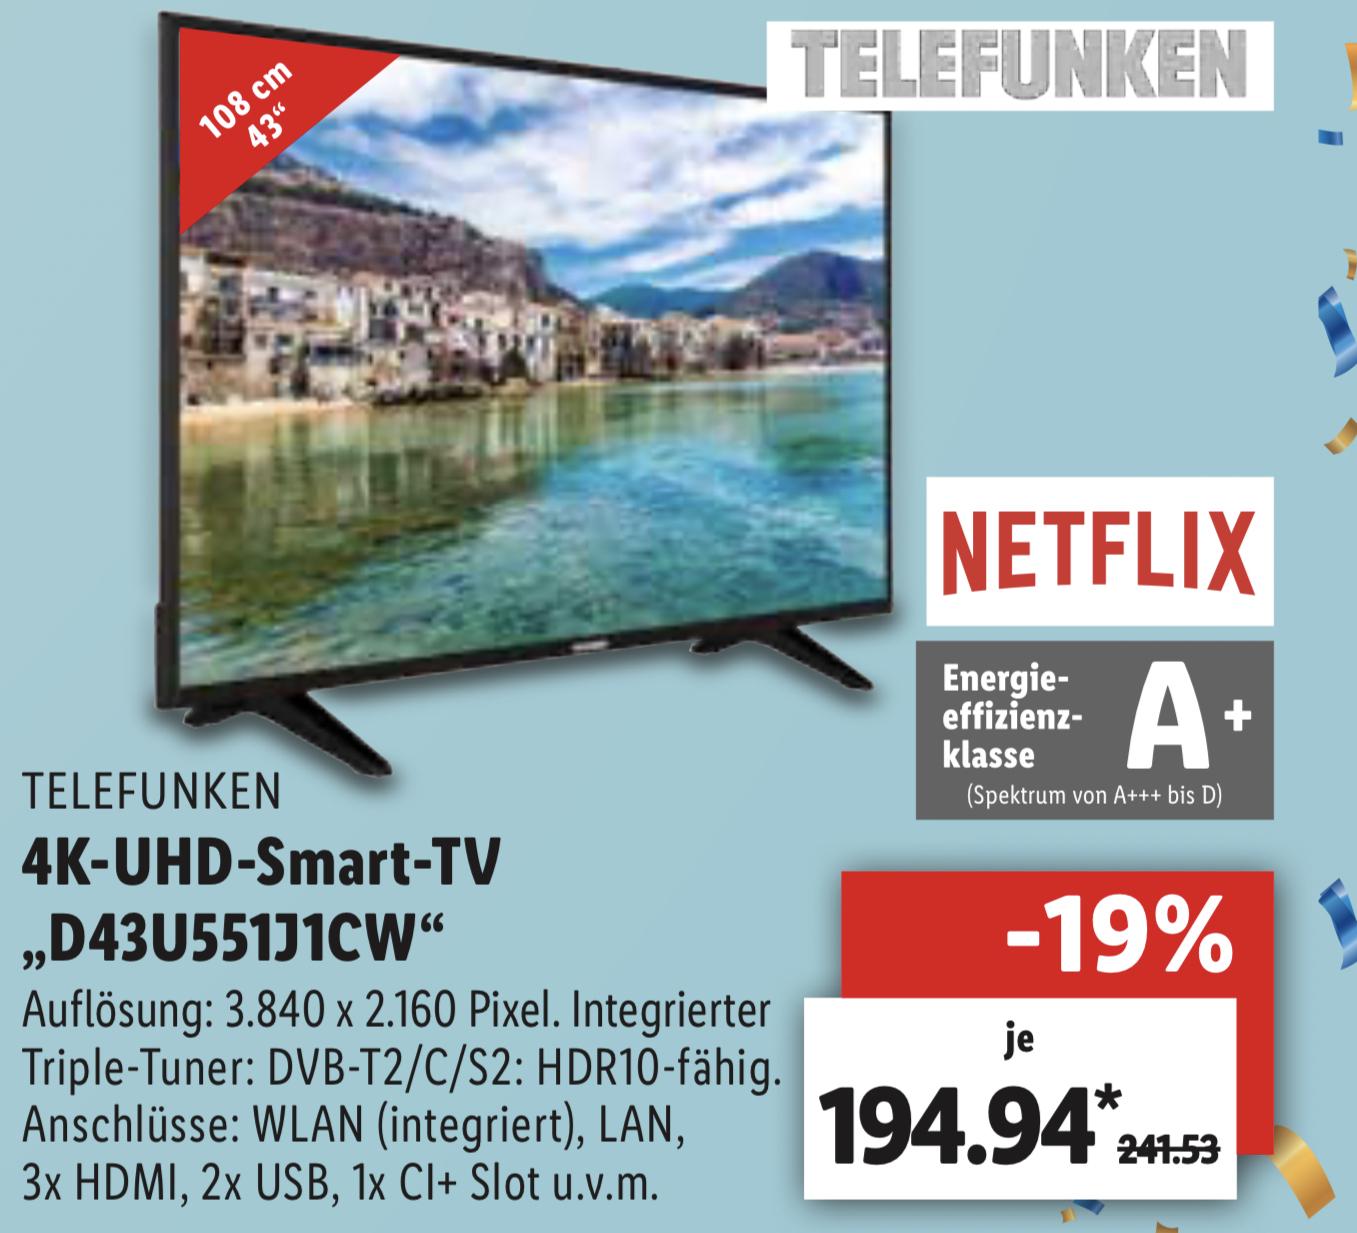 Lokal Lidl: Telefunken 43 Zoll 108cm 4K UHD Smart TV Triple Tuner Alexa kompatibel für 189,94€ - Weiden u. Kremmen